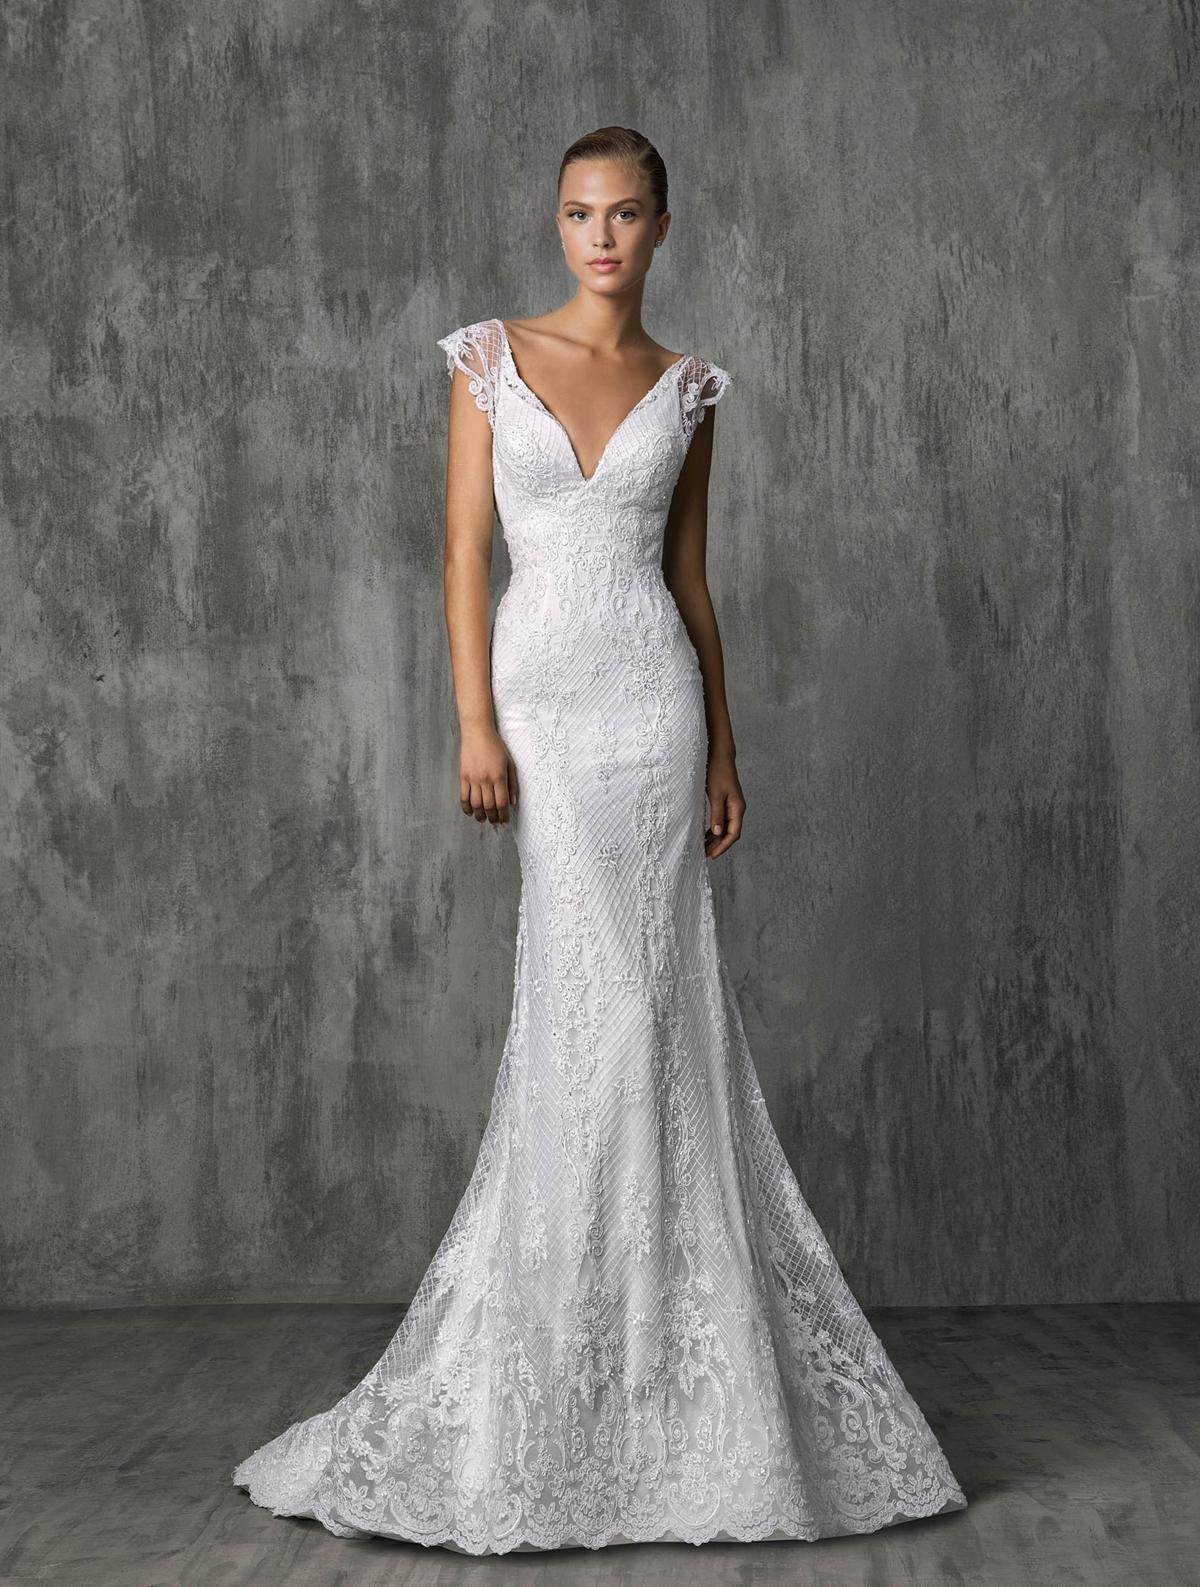 9e0e43486cc Stunning Victoria Kyriakides wedding dressed